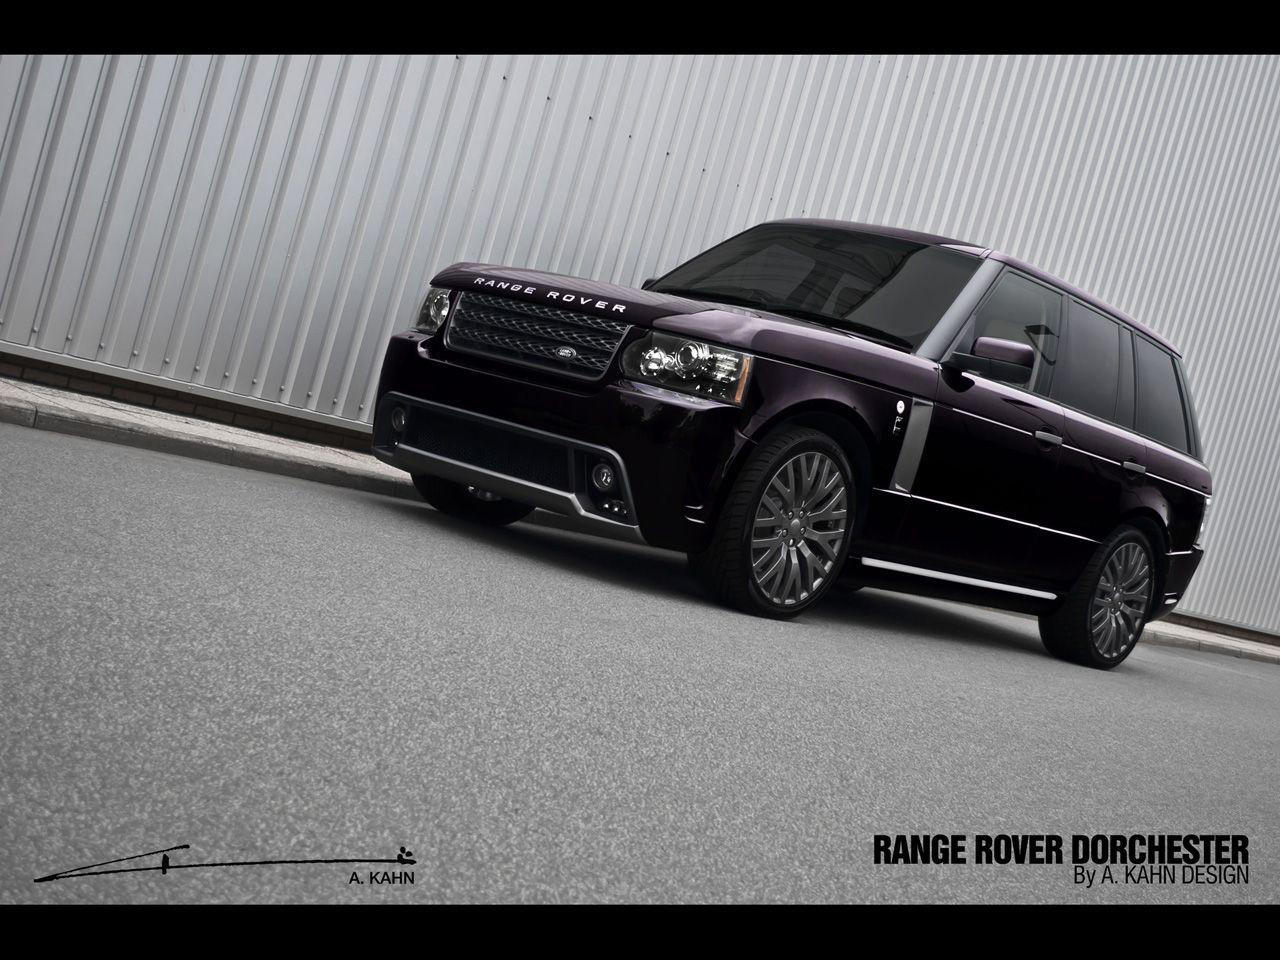 2012 A Kahn Design Range Rover Vogue Dorchester Edition